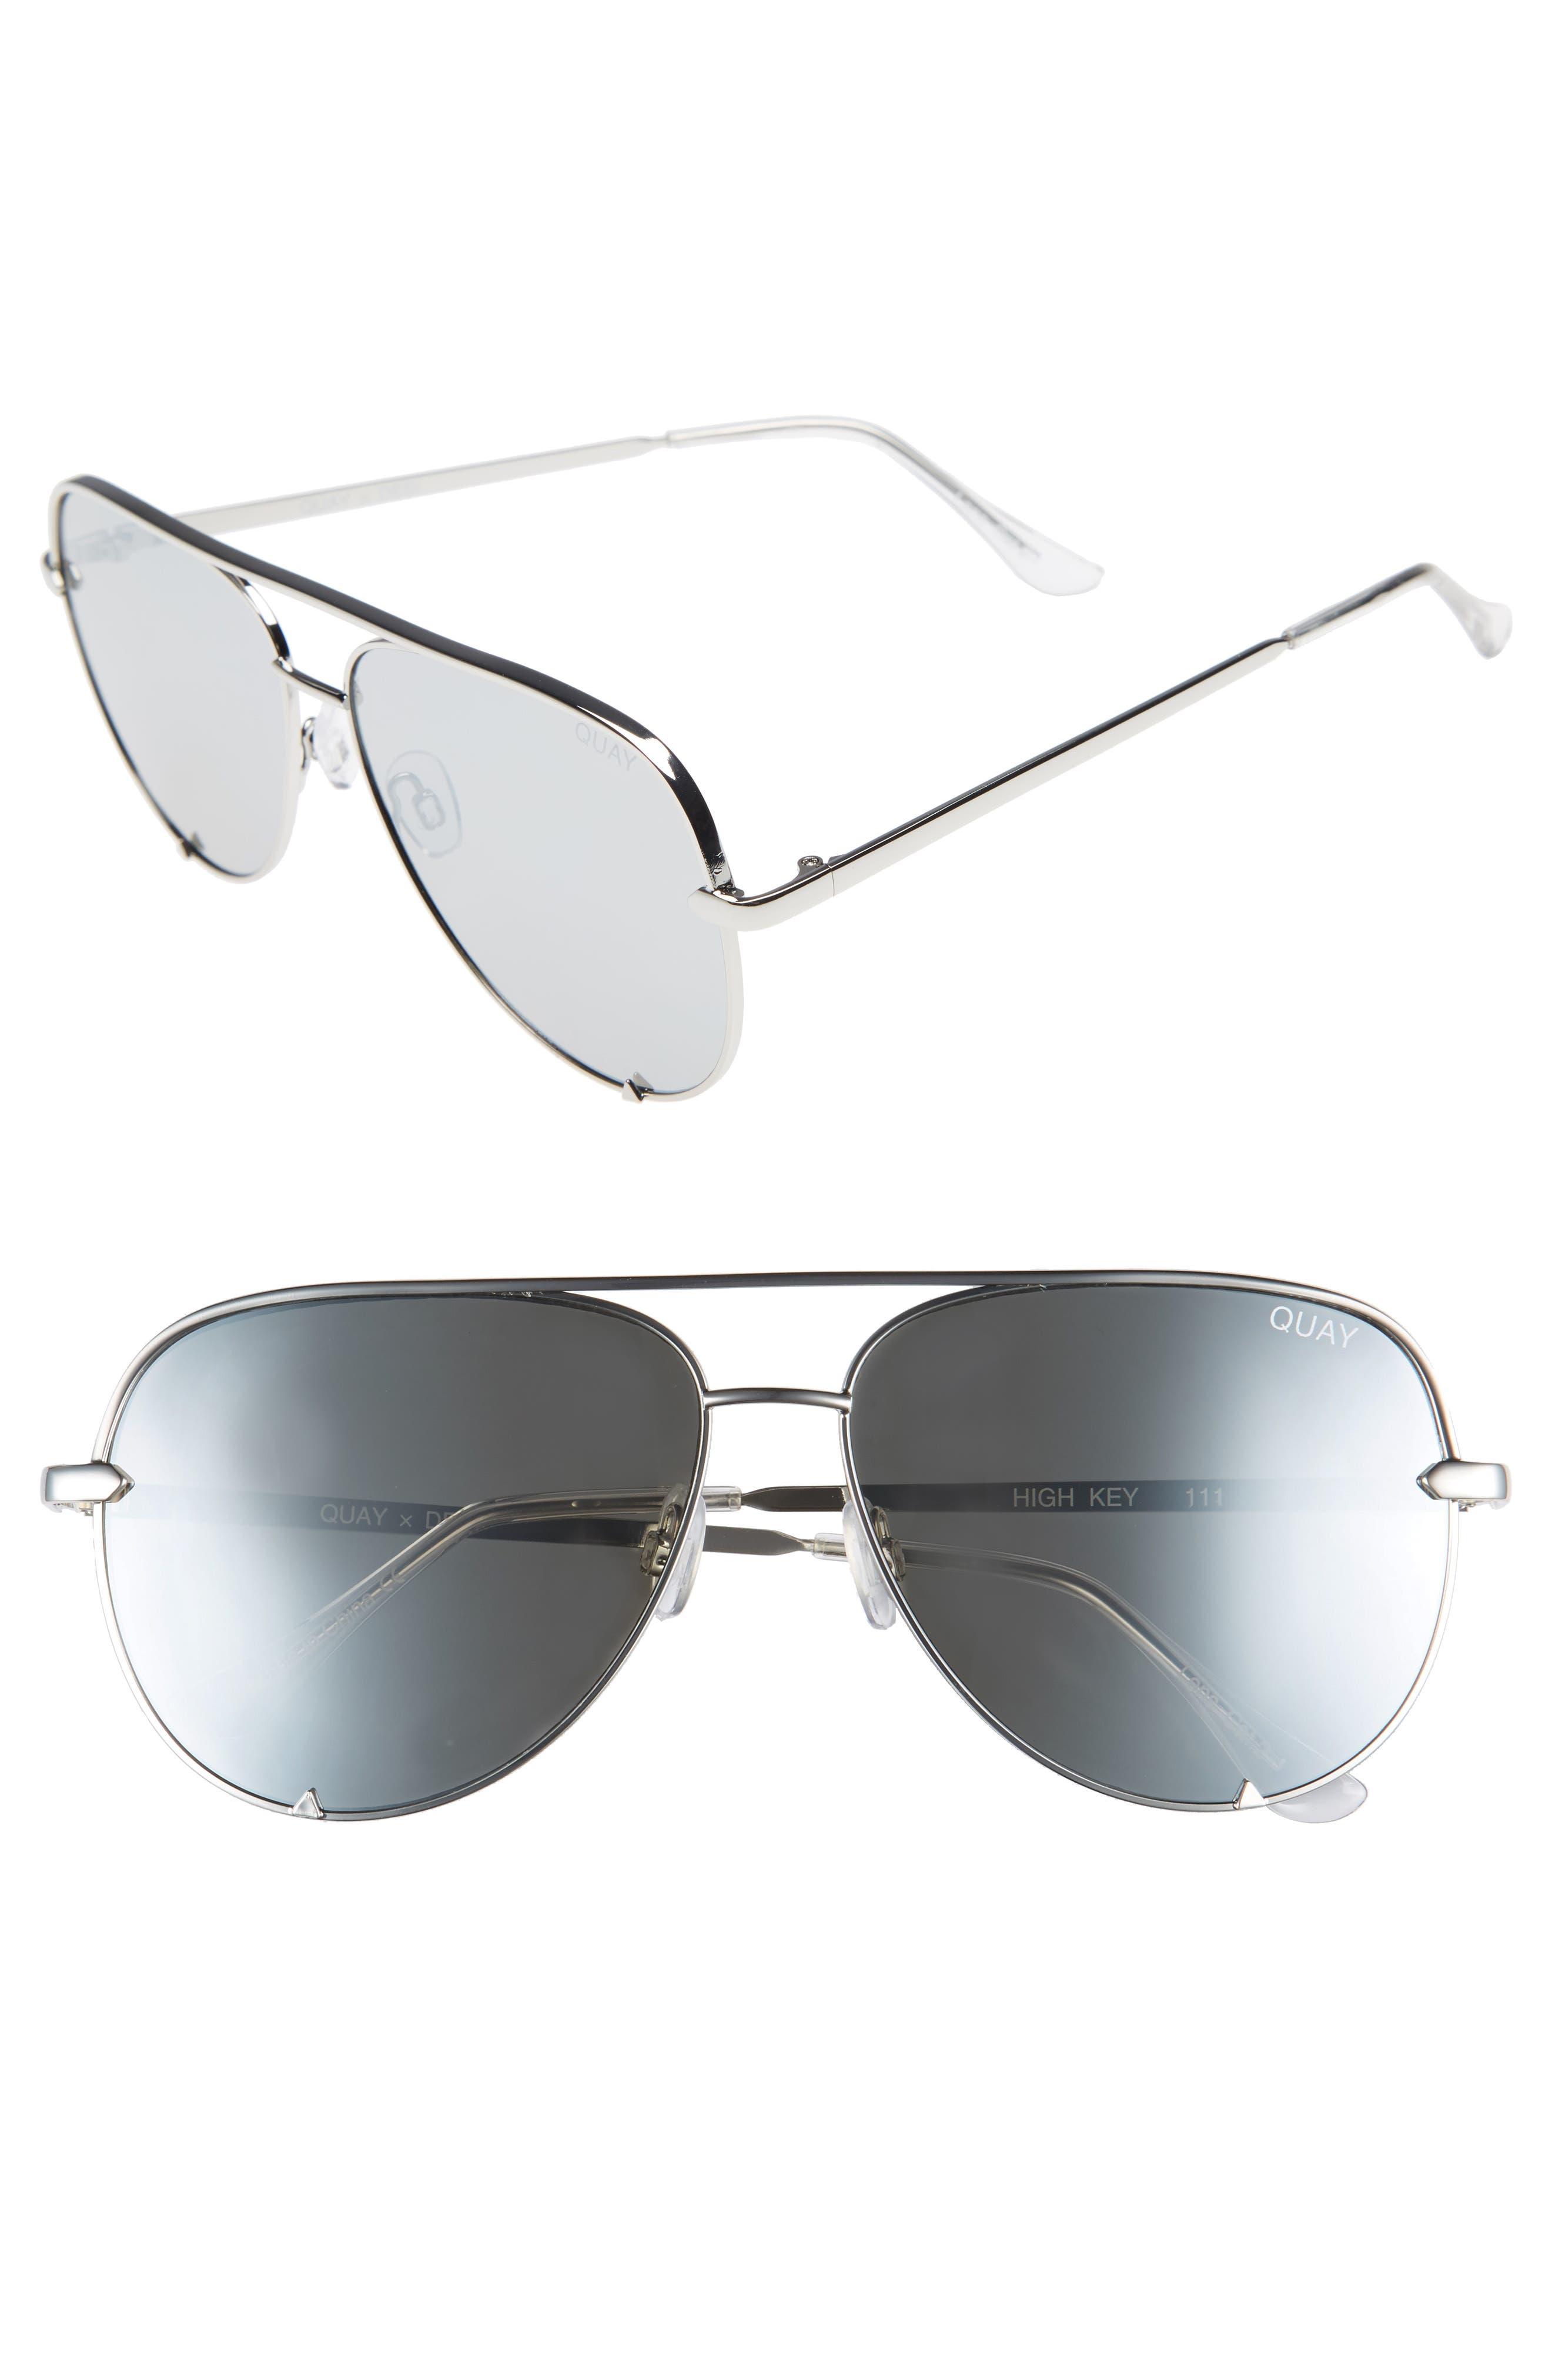 x Desi Perkins High Key 62mm Aviator Sunglasses,                             Main thumbnail 1, color,                             SILVER/ SILVER